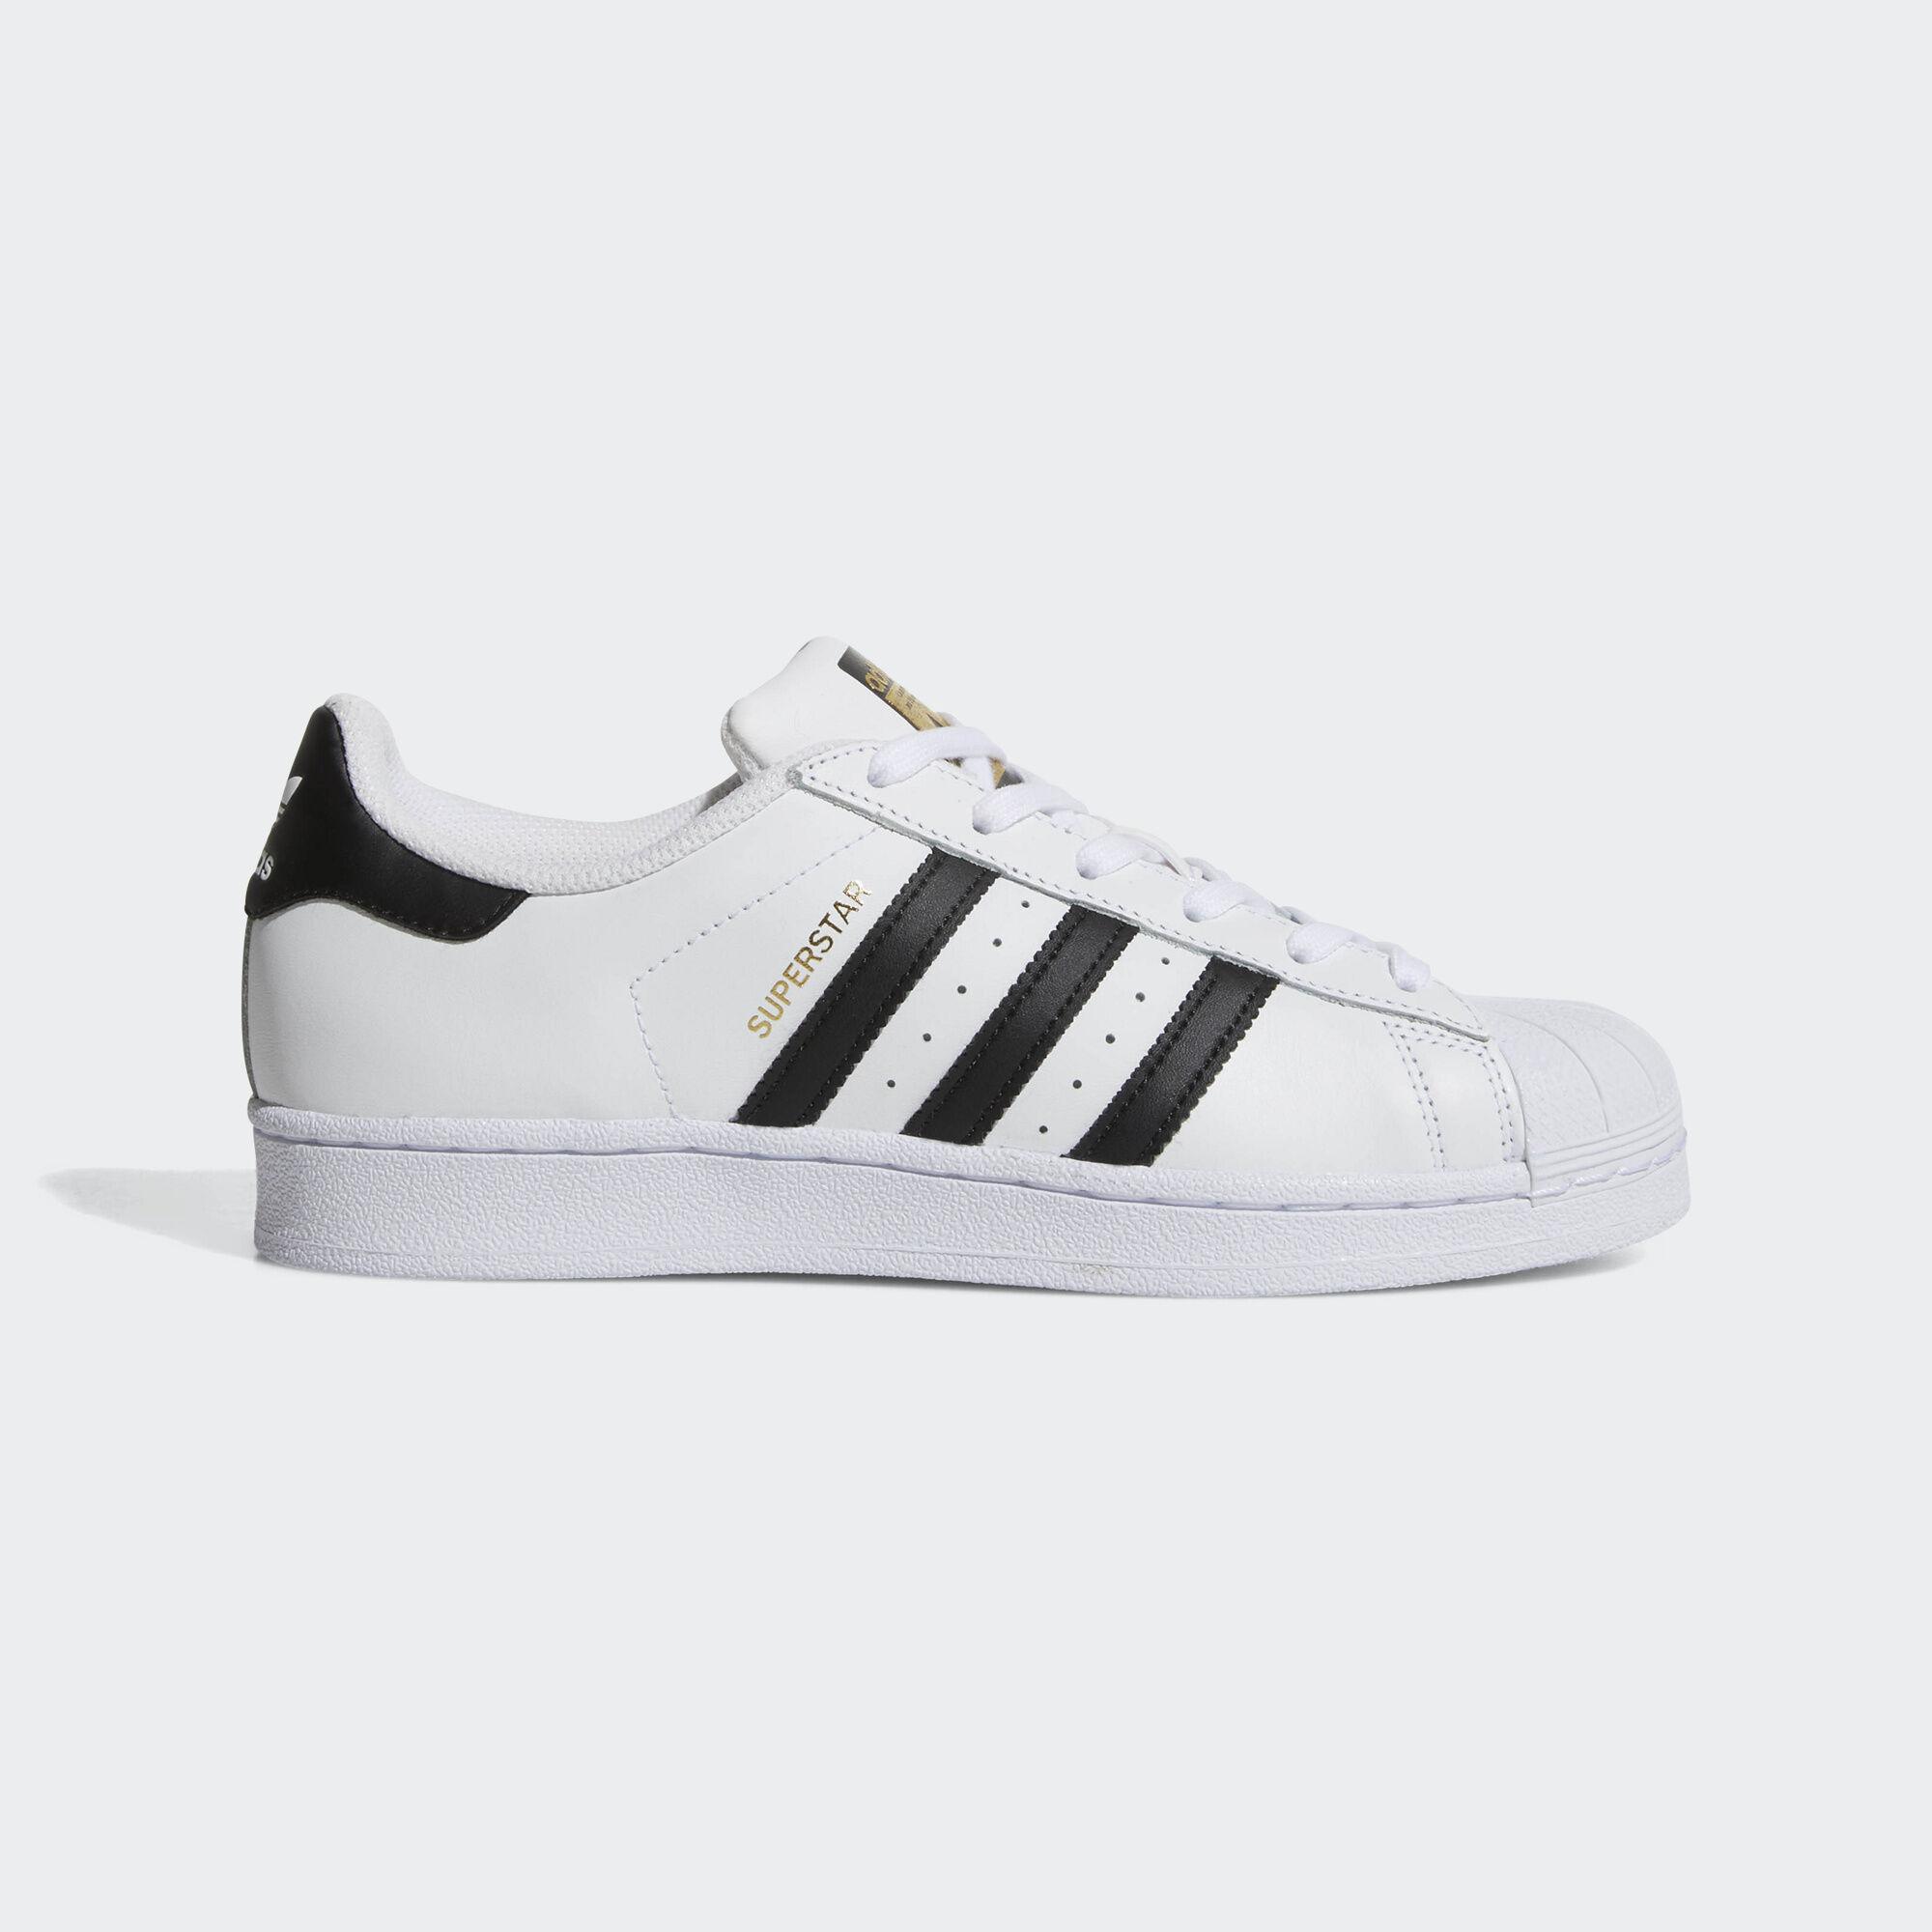 Adidas Superstar Shoes White Adidas Regional